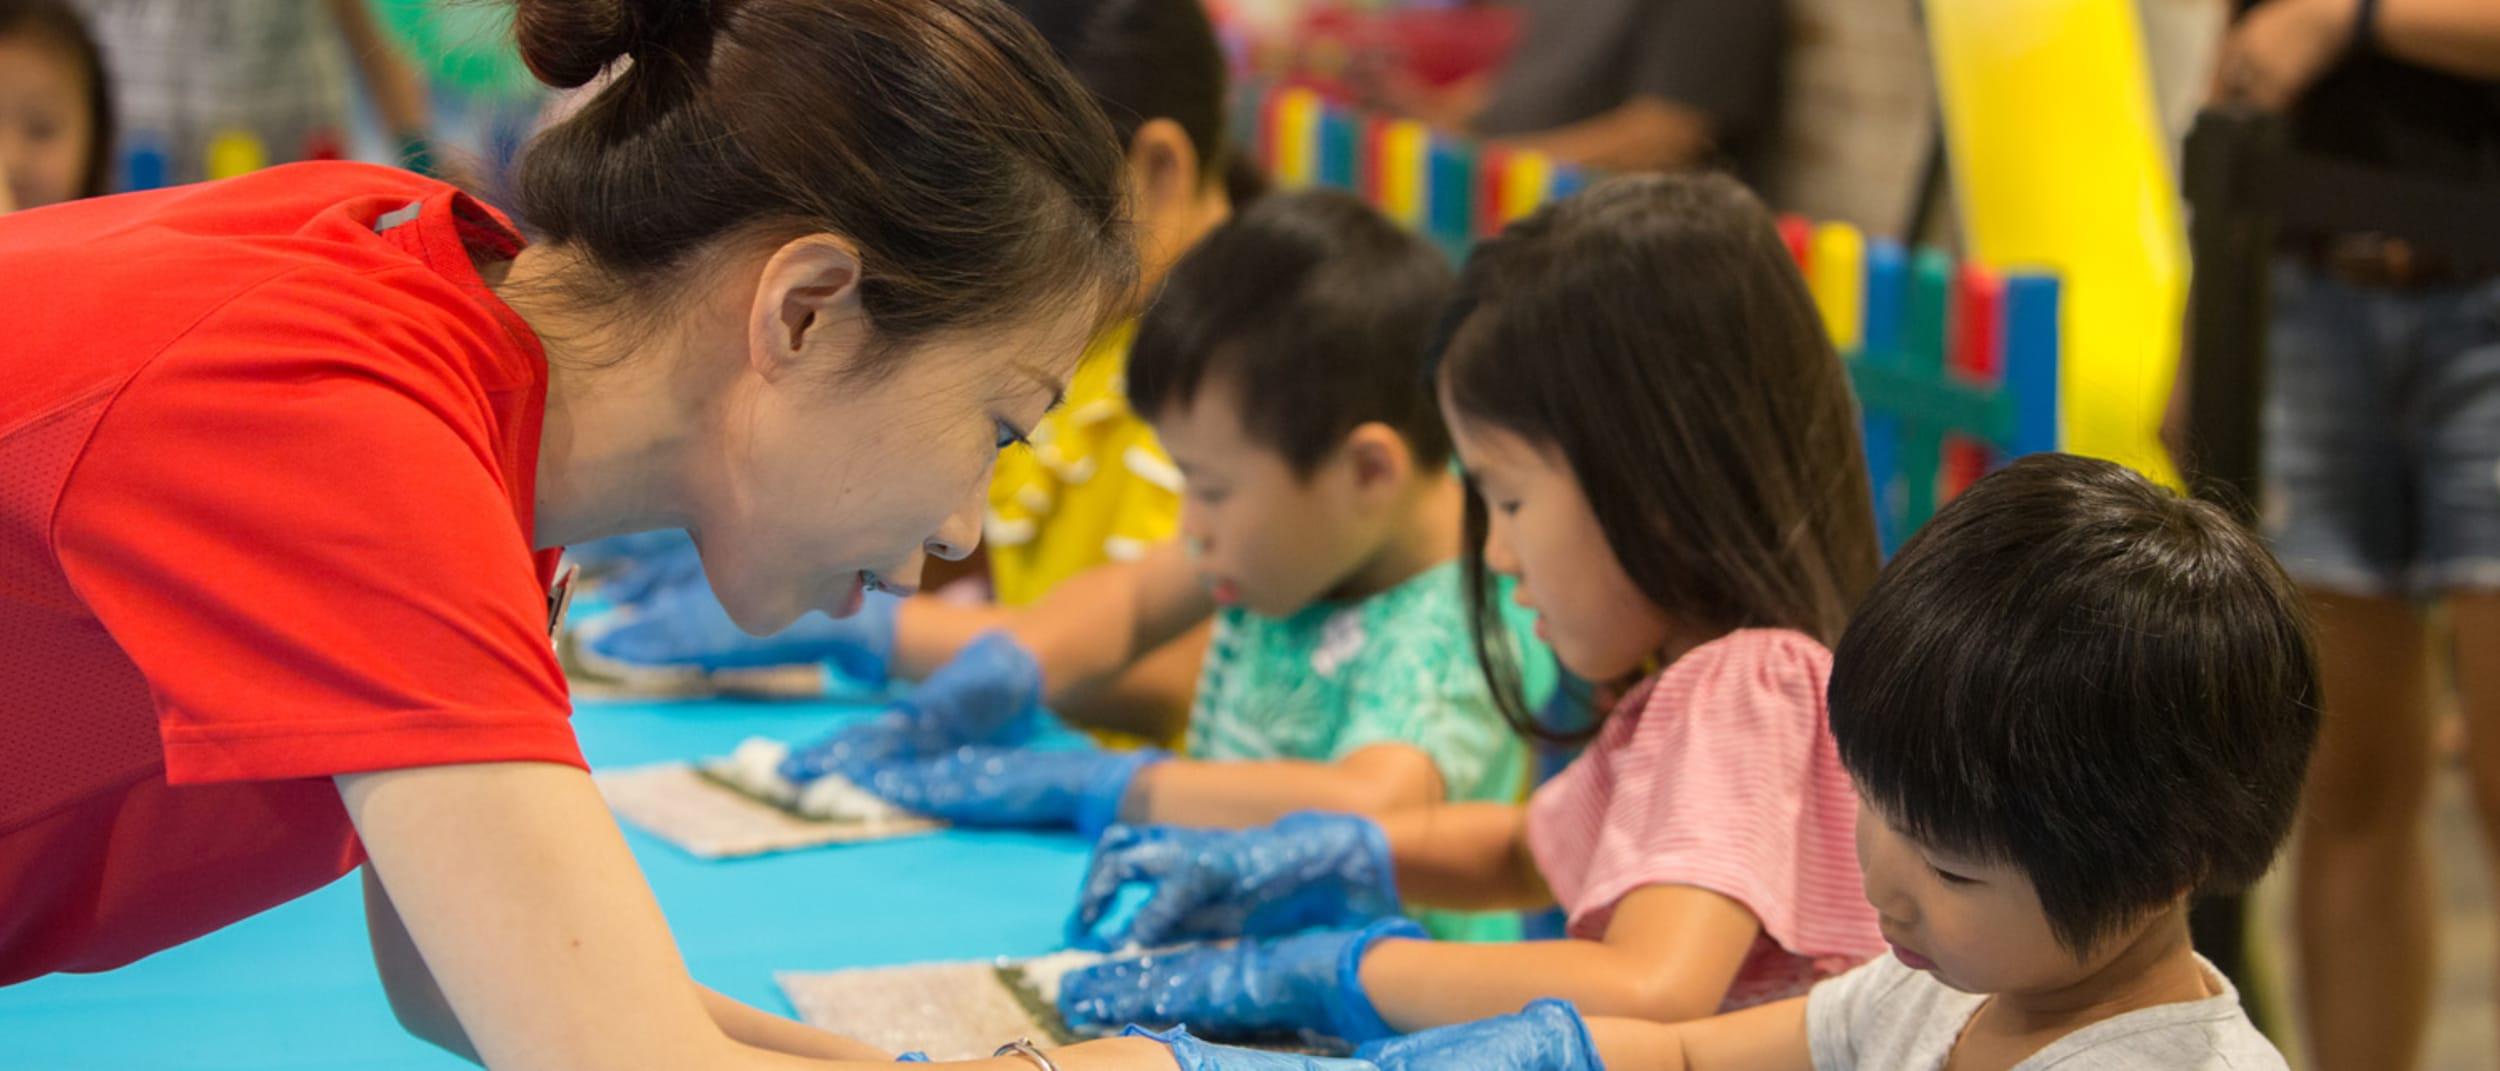 Kids sushi making workshops with Sushi Hub